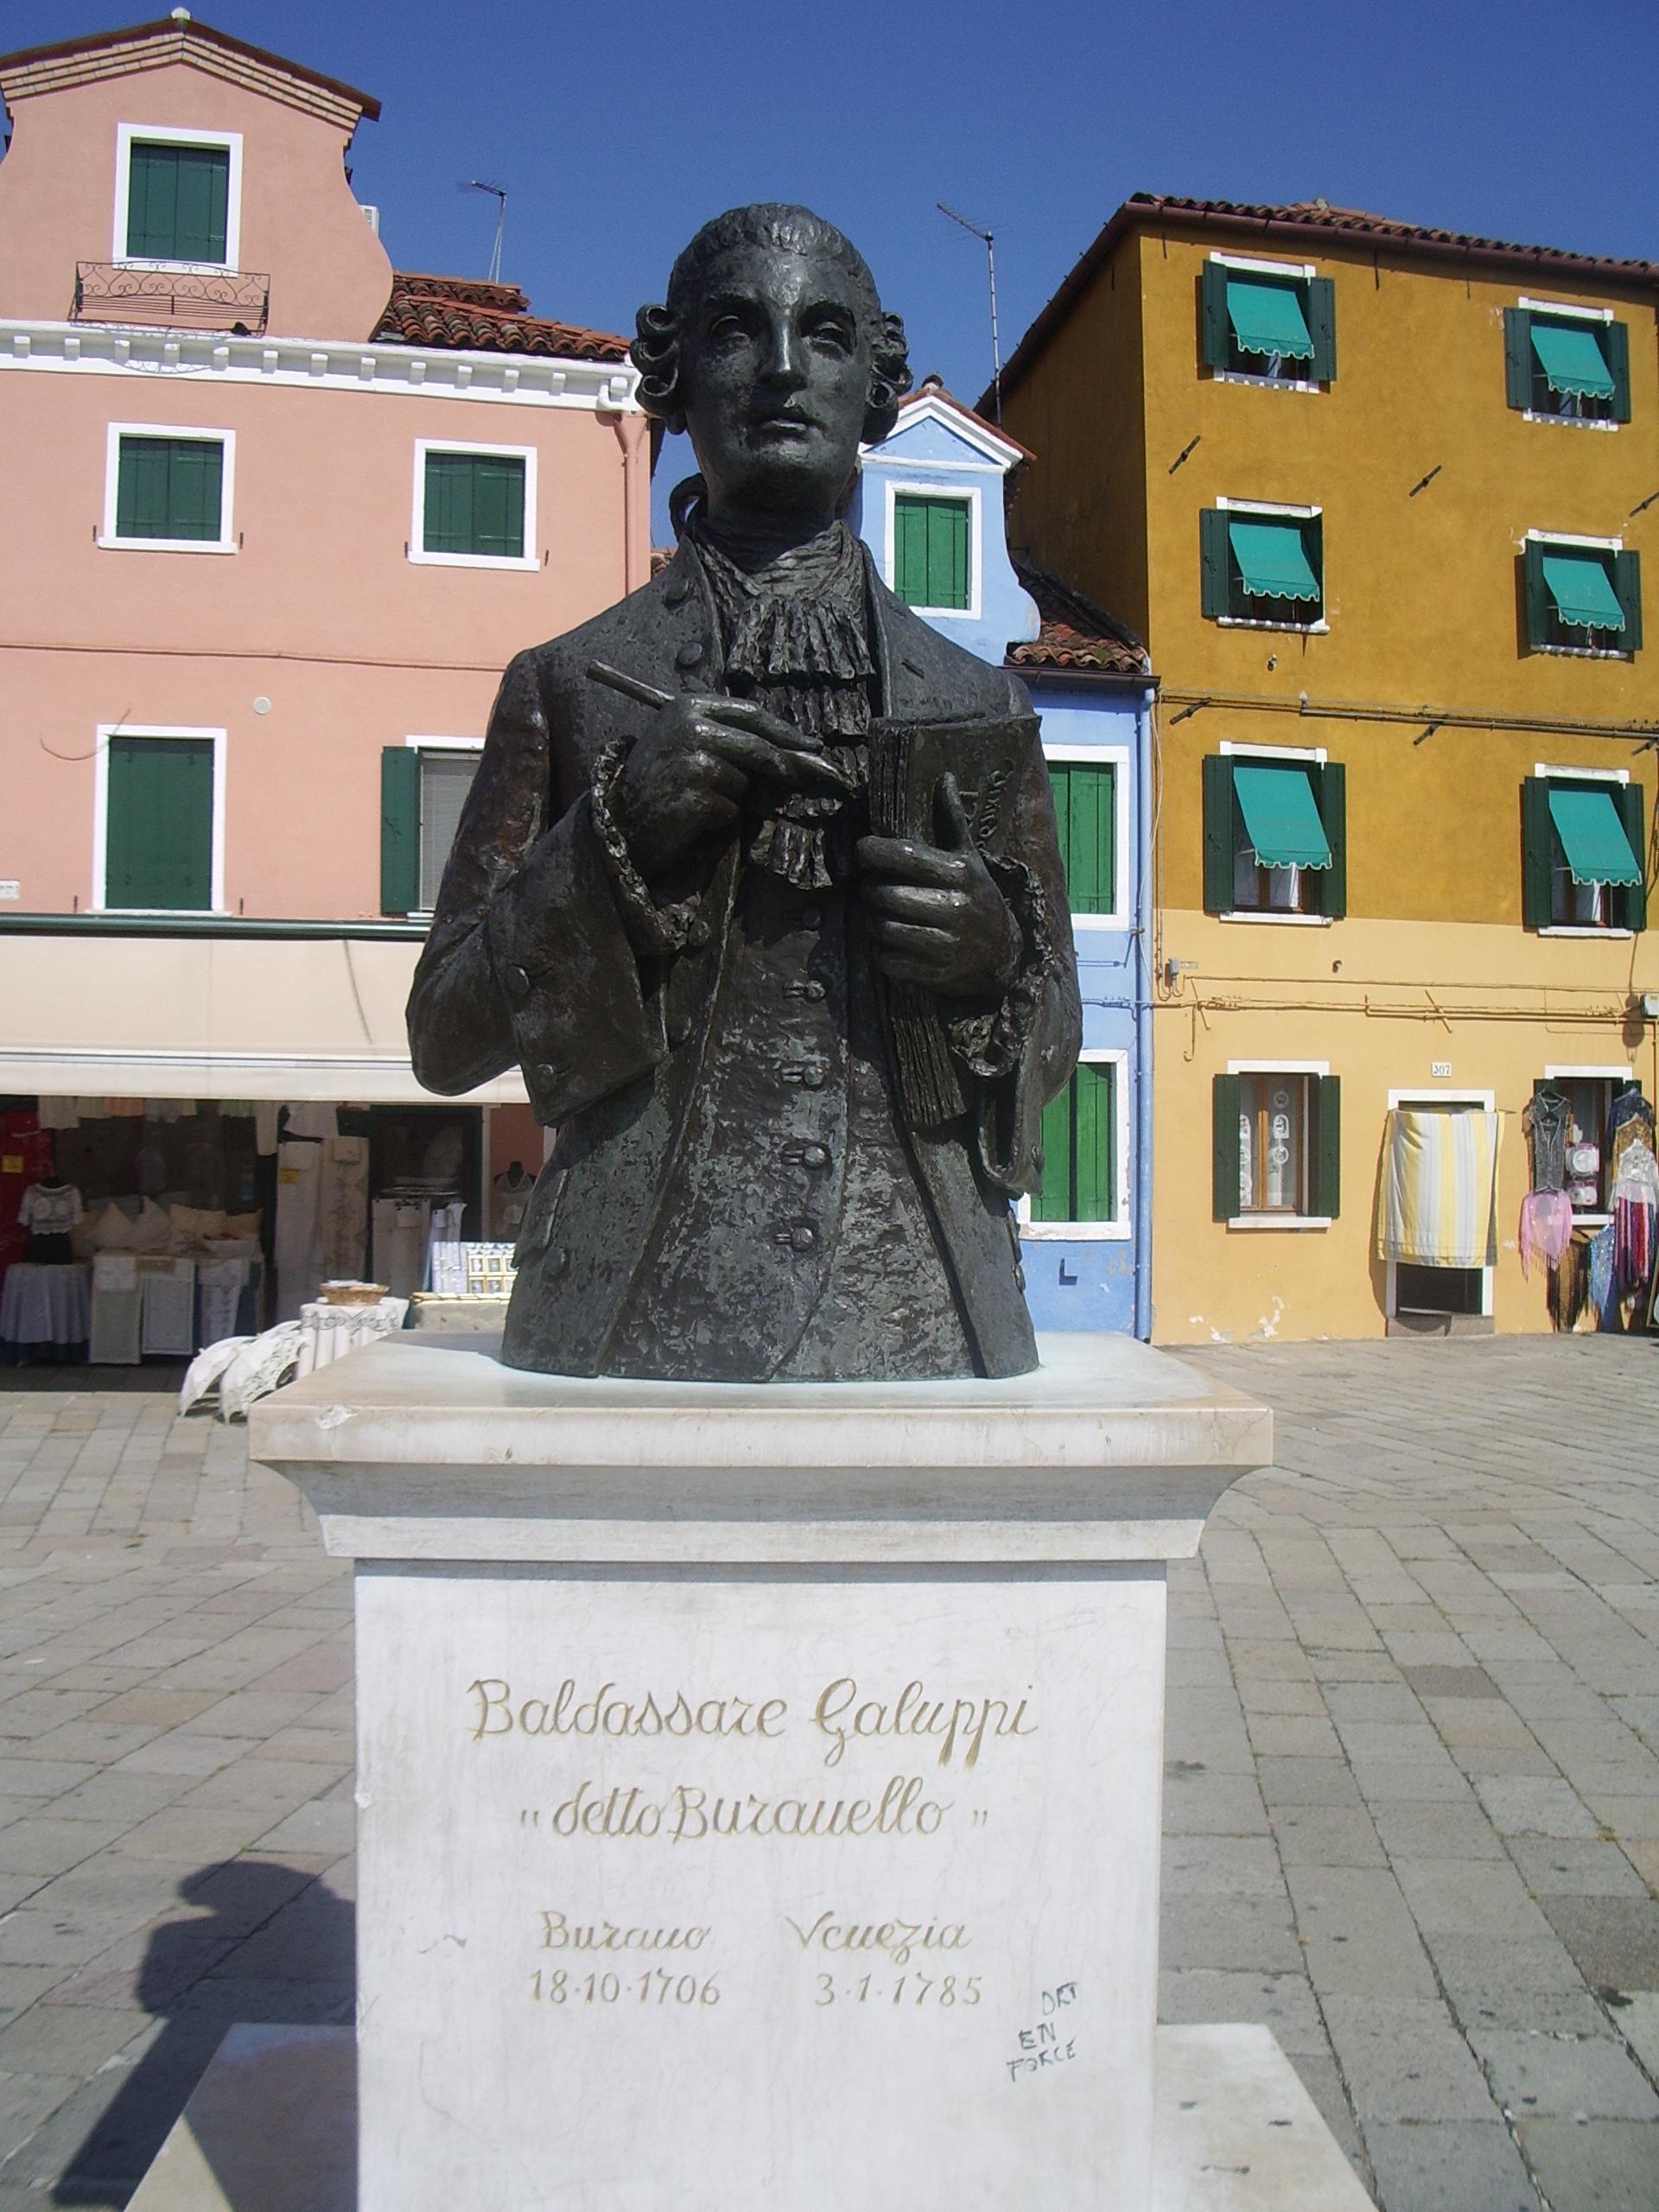 File:Baldassare-Galuppi-Burano.jpg